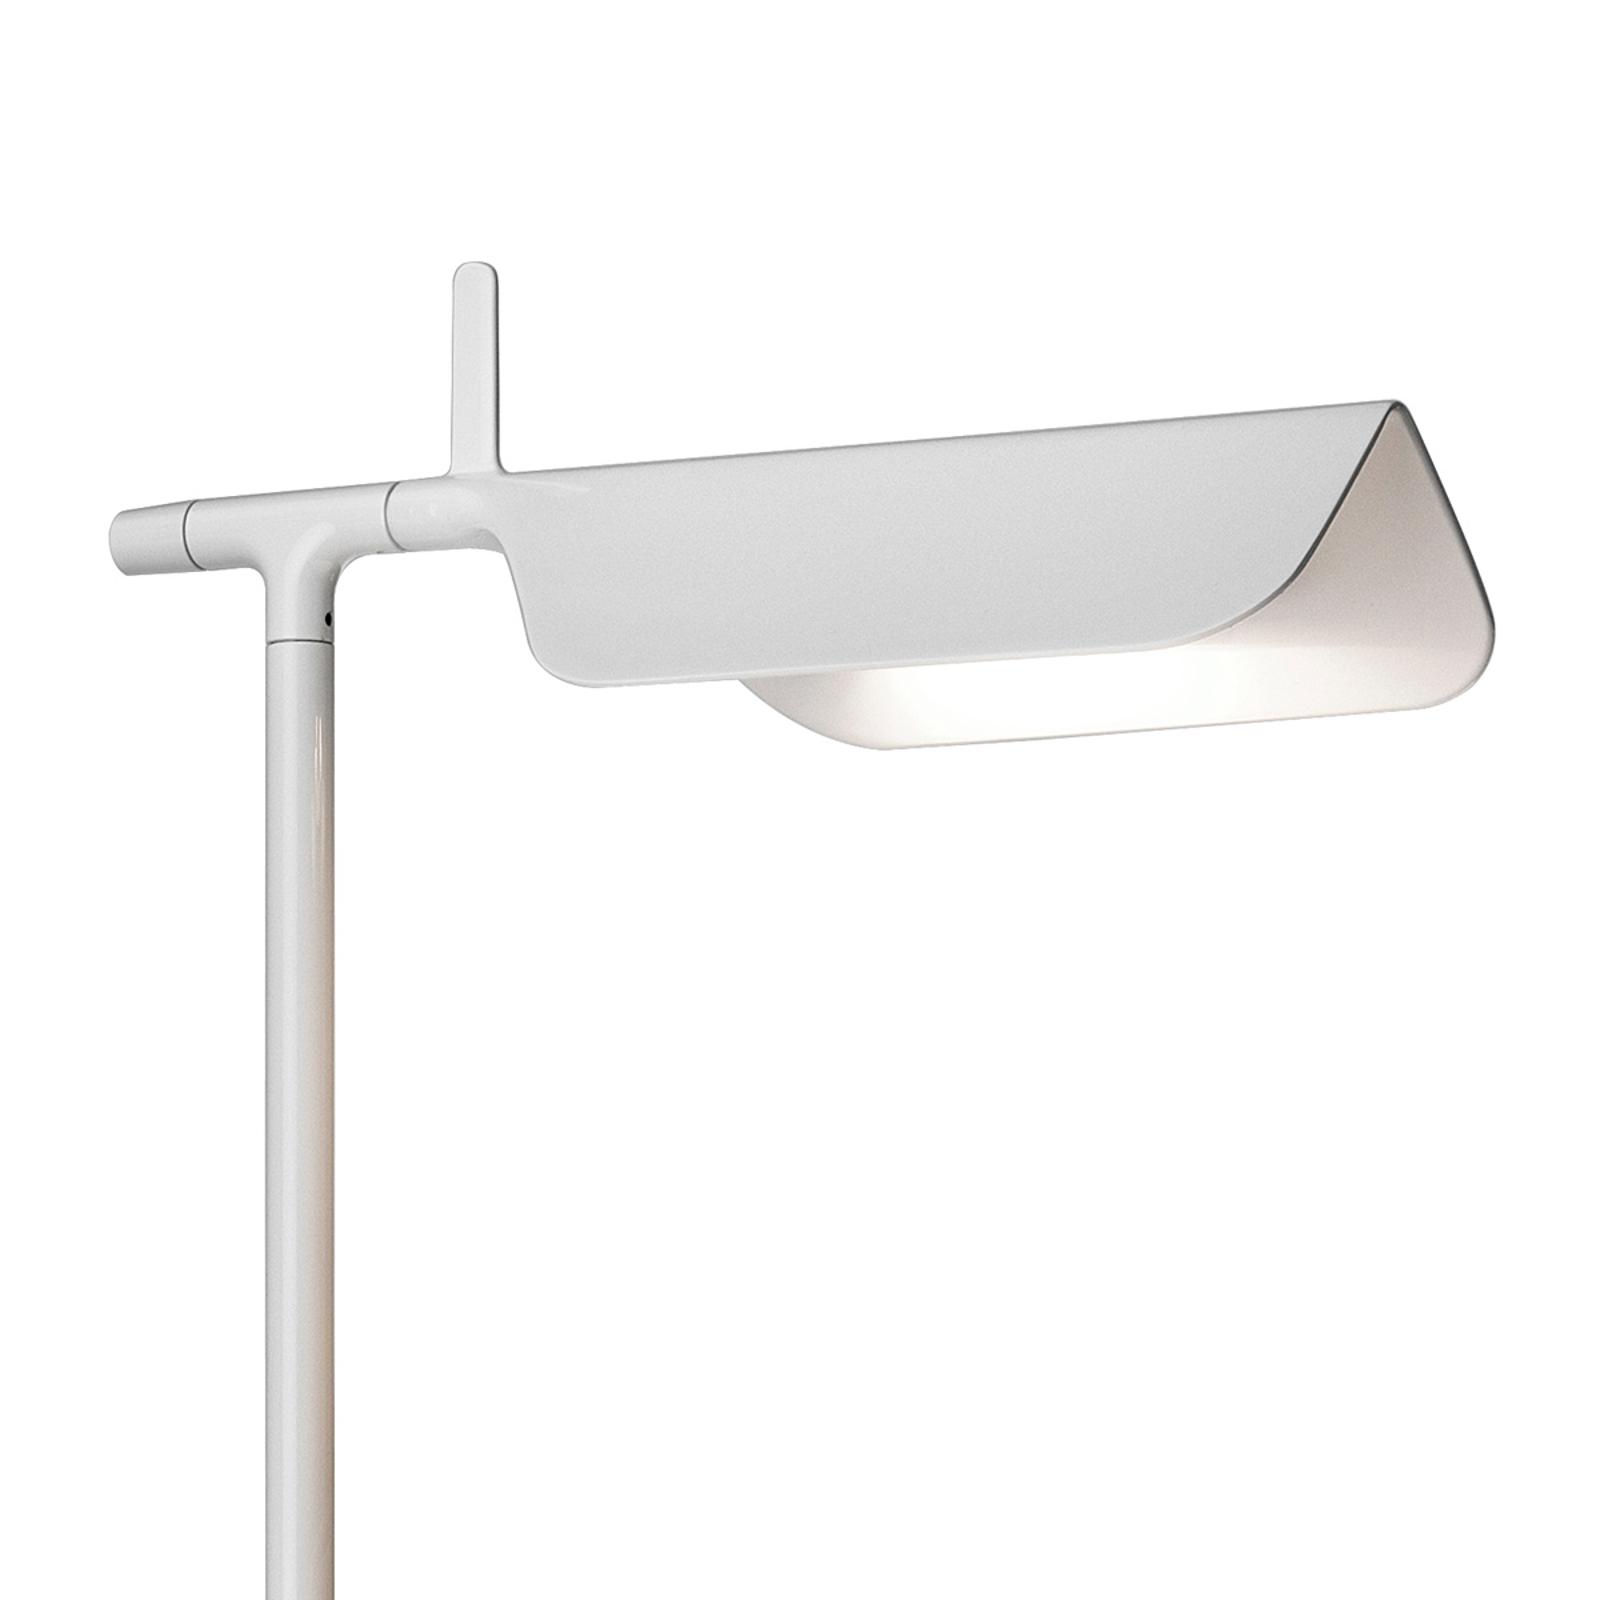 FLOS Tab LED F - puristická stojací lampa, bílá